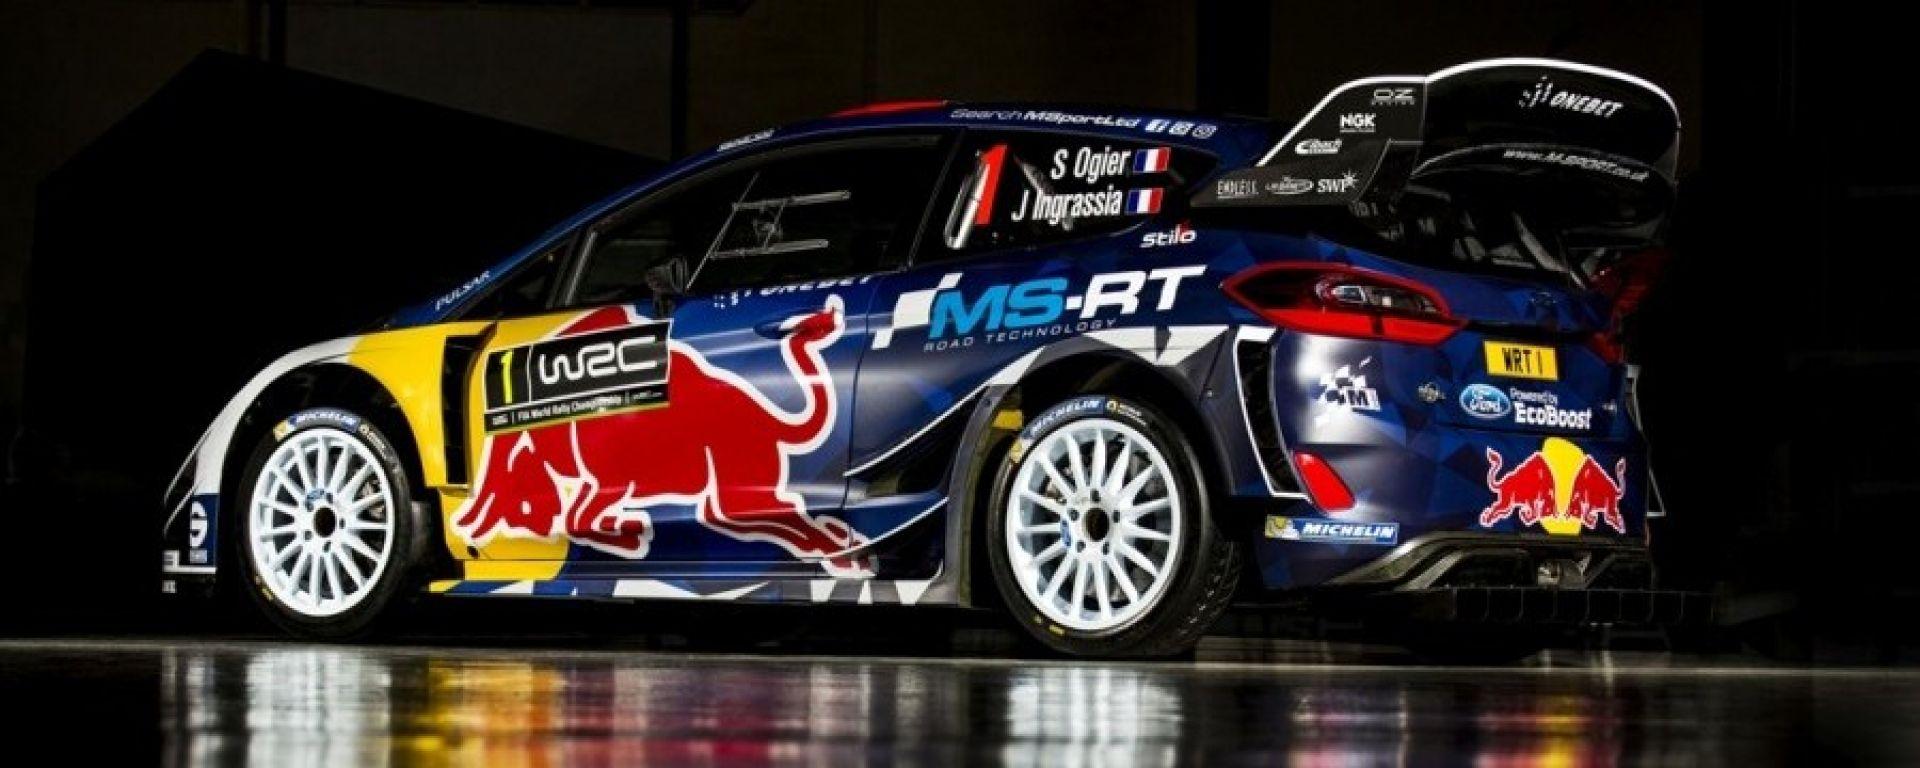 Ecco la Ford Fiesta WRC del Team M-Sport